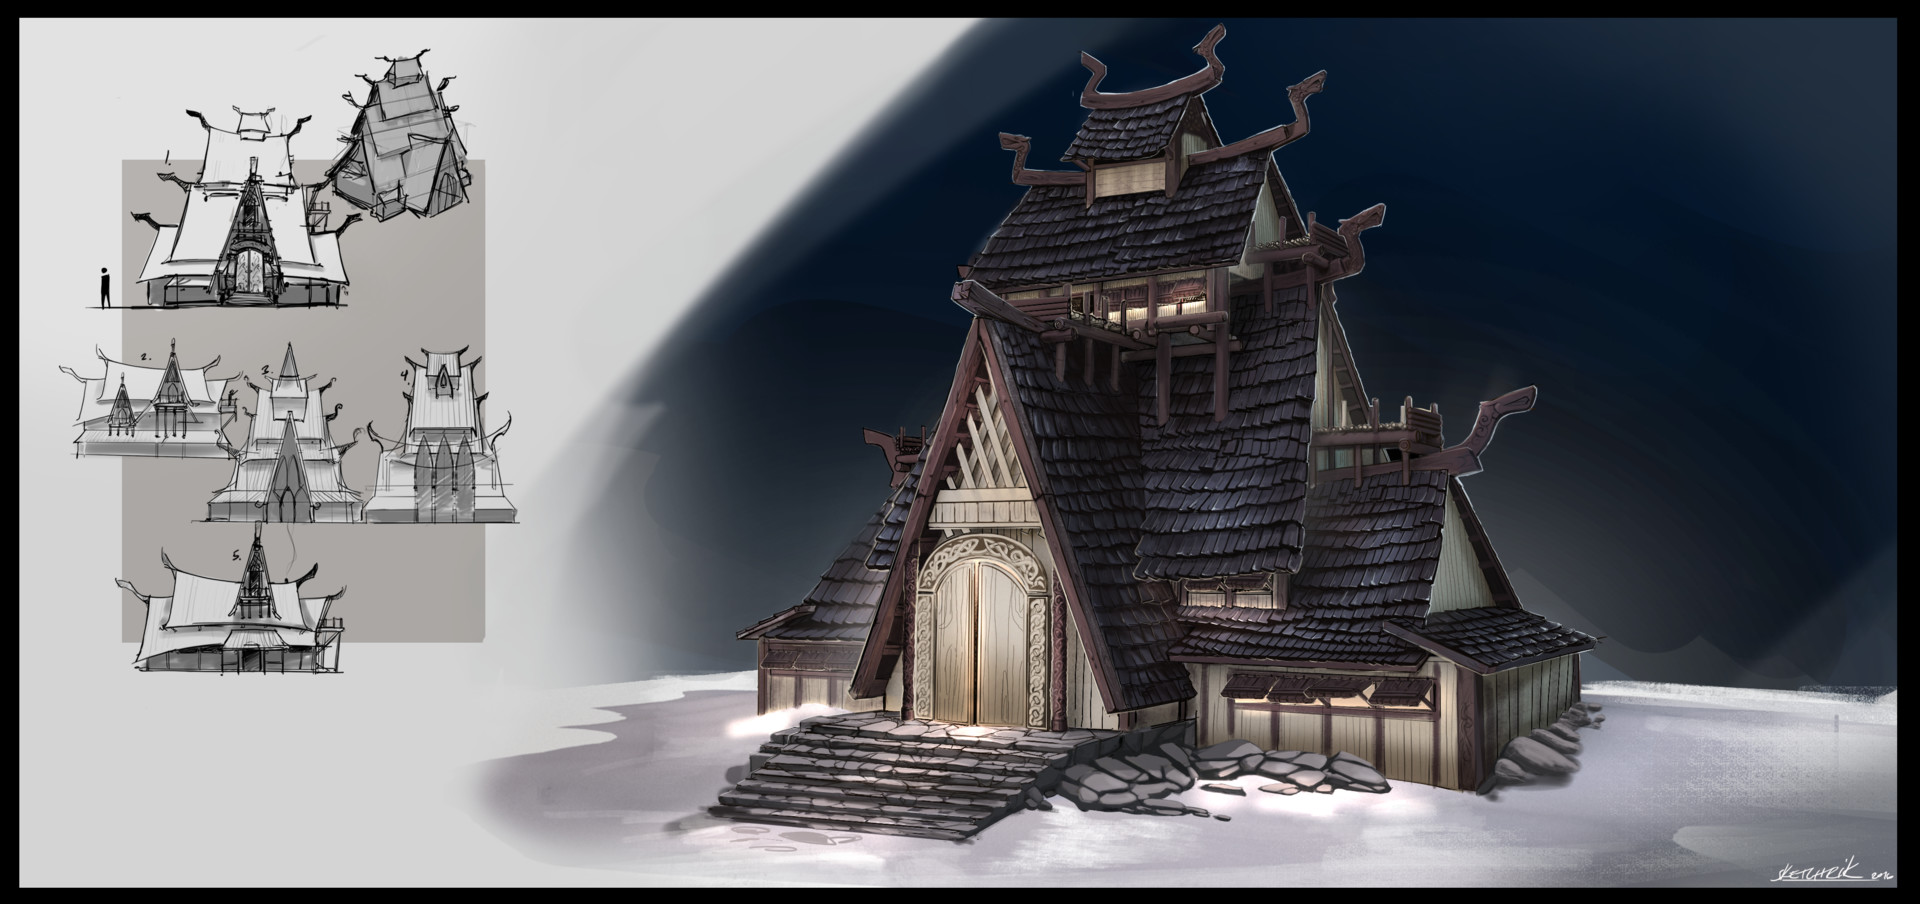 Henrik lundblx viking house uplox